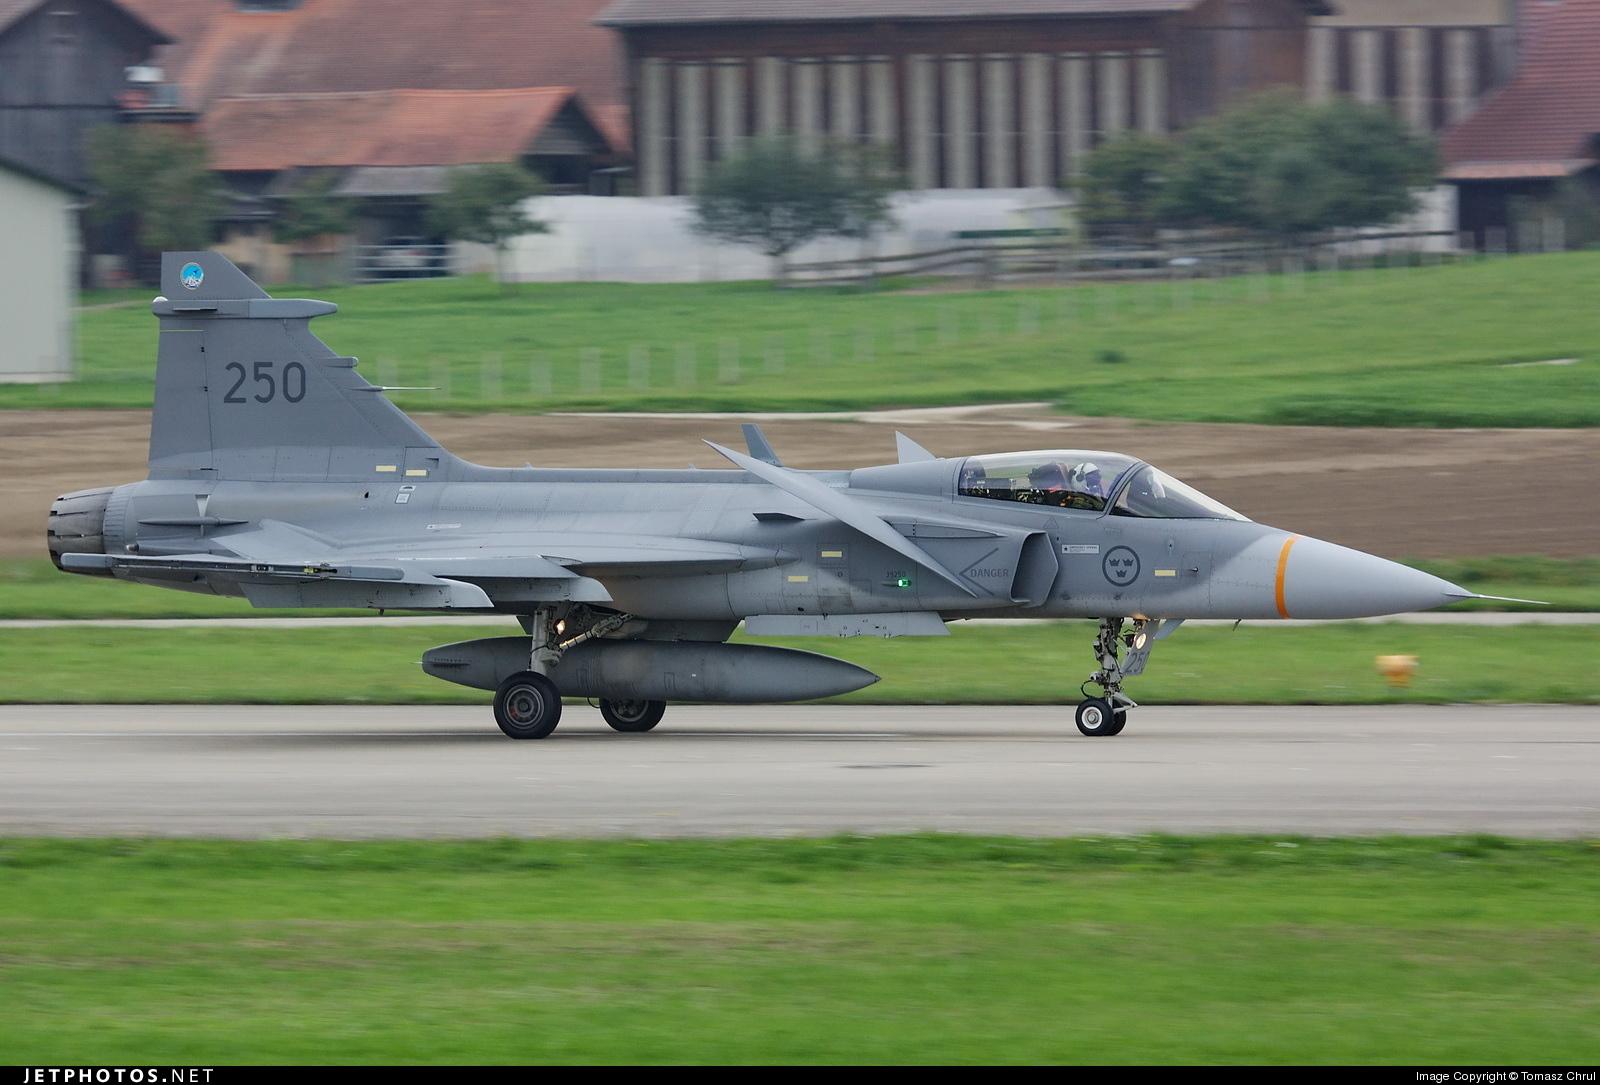 39250 - Saab JAS-39C Gripen - Sweden - Air Force